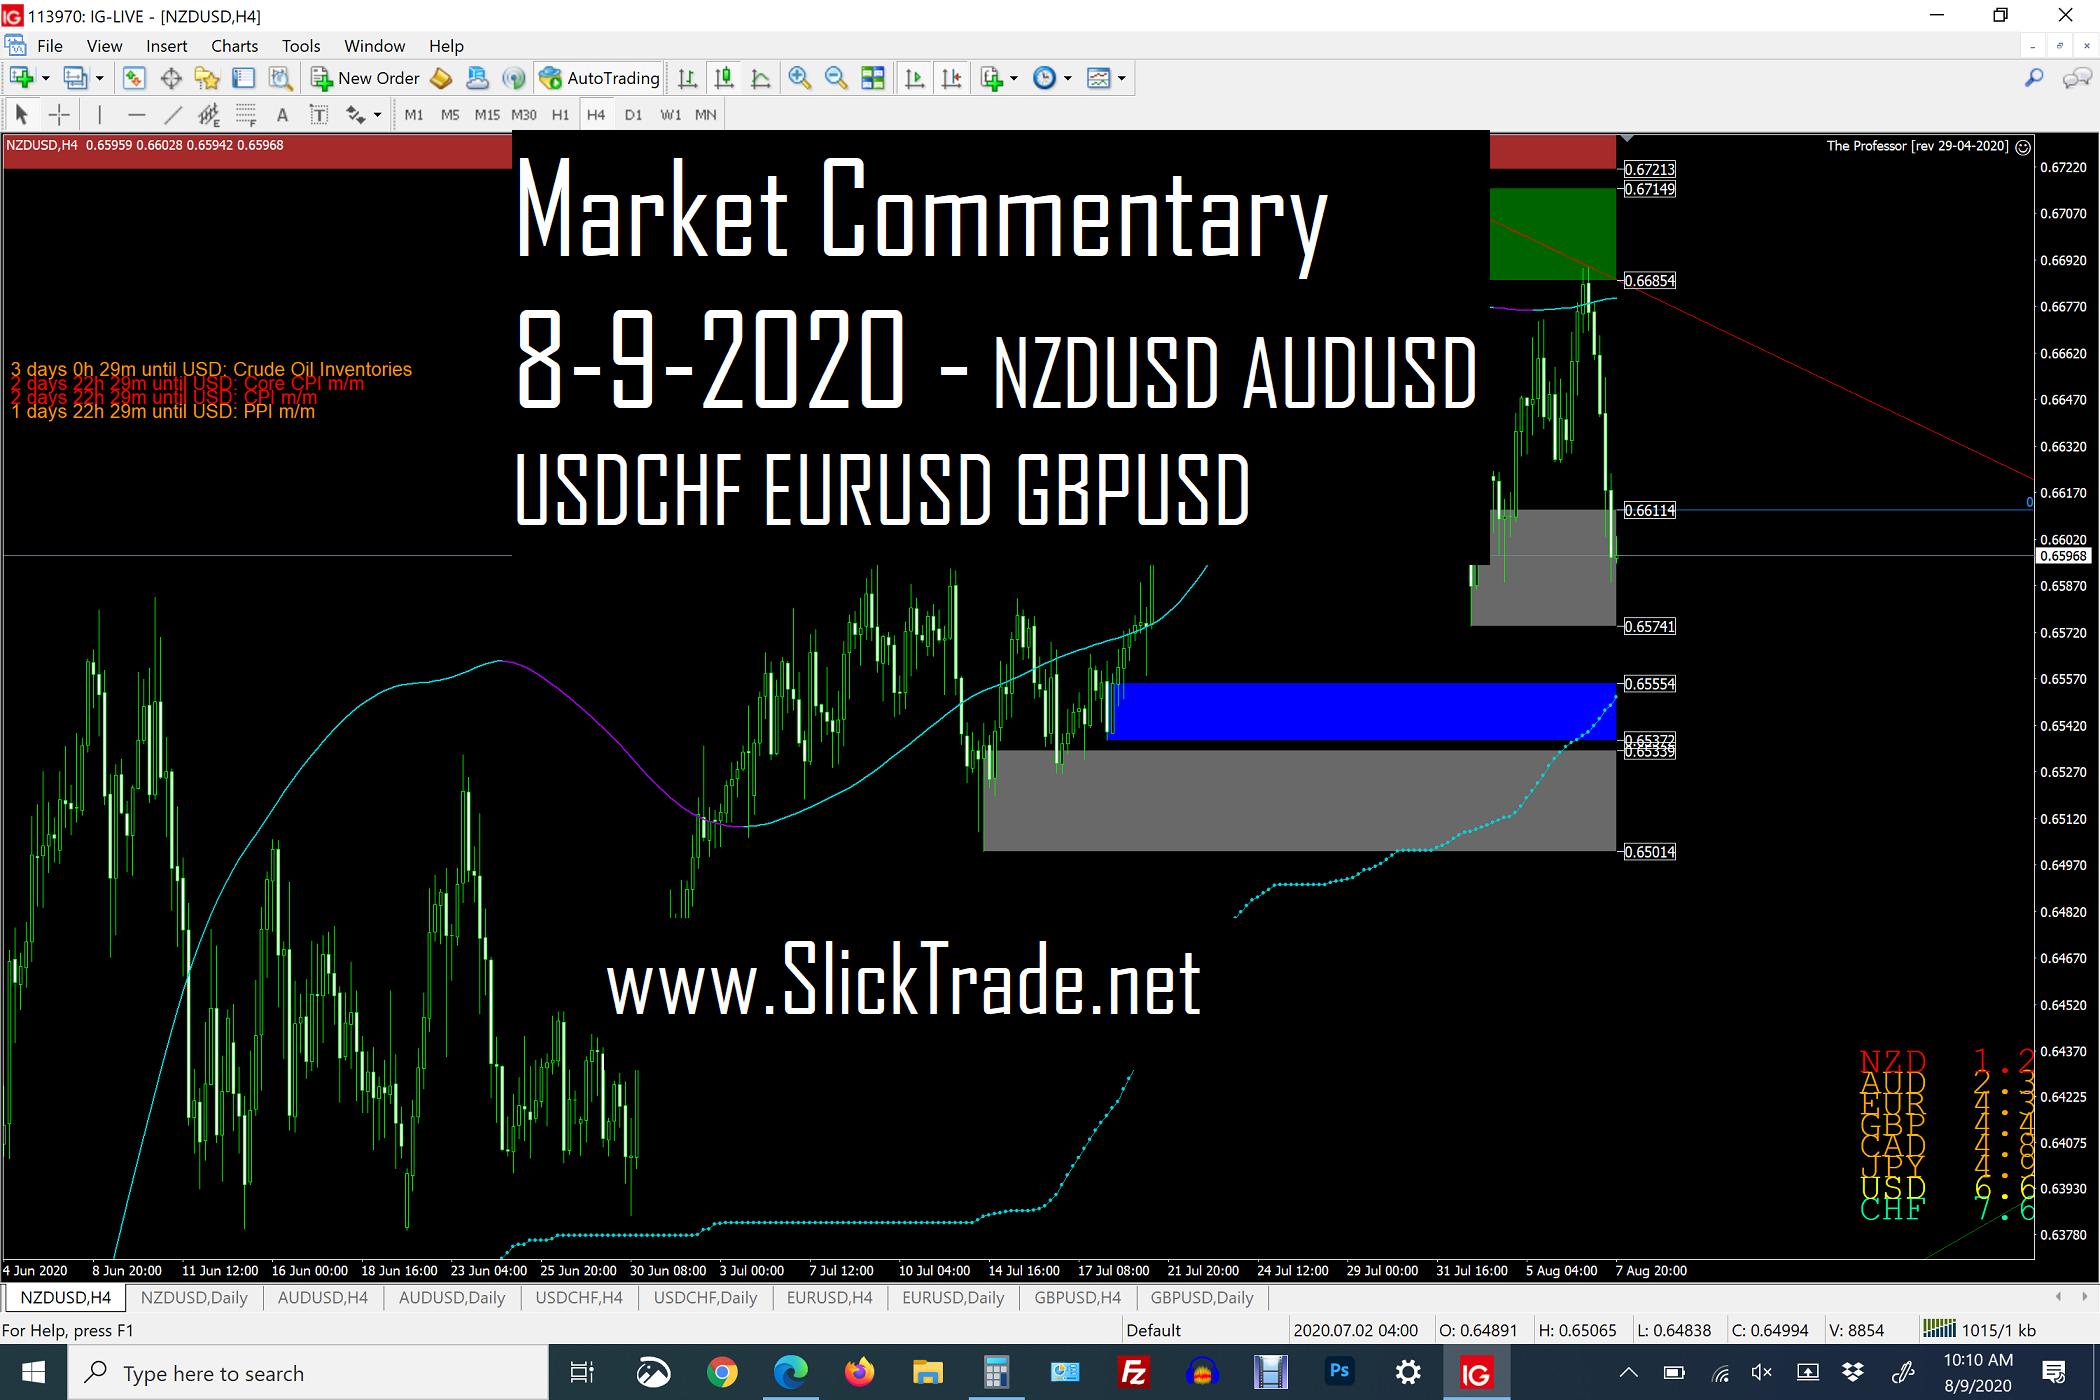 Market Commentary 8-9-2020 - NZDUSD AUDUSD USDCHF EURUSD GBPUSD